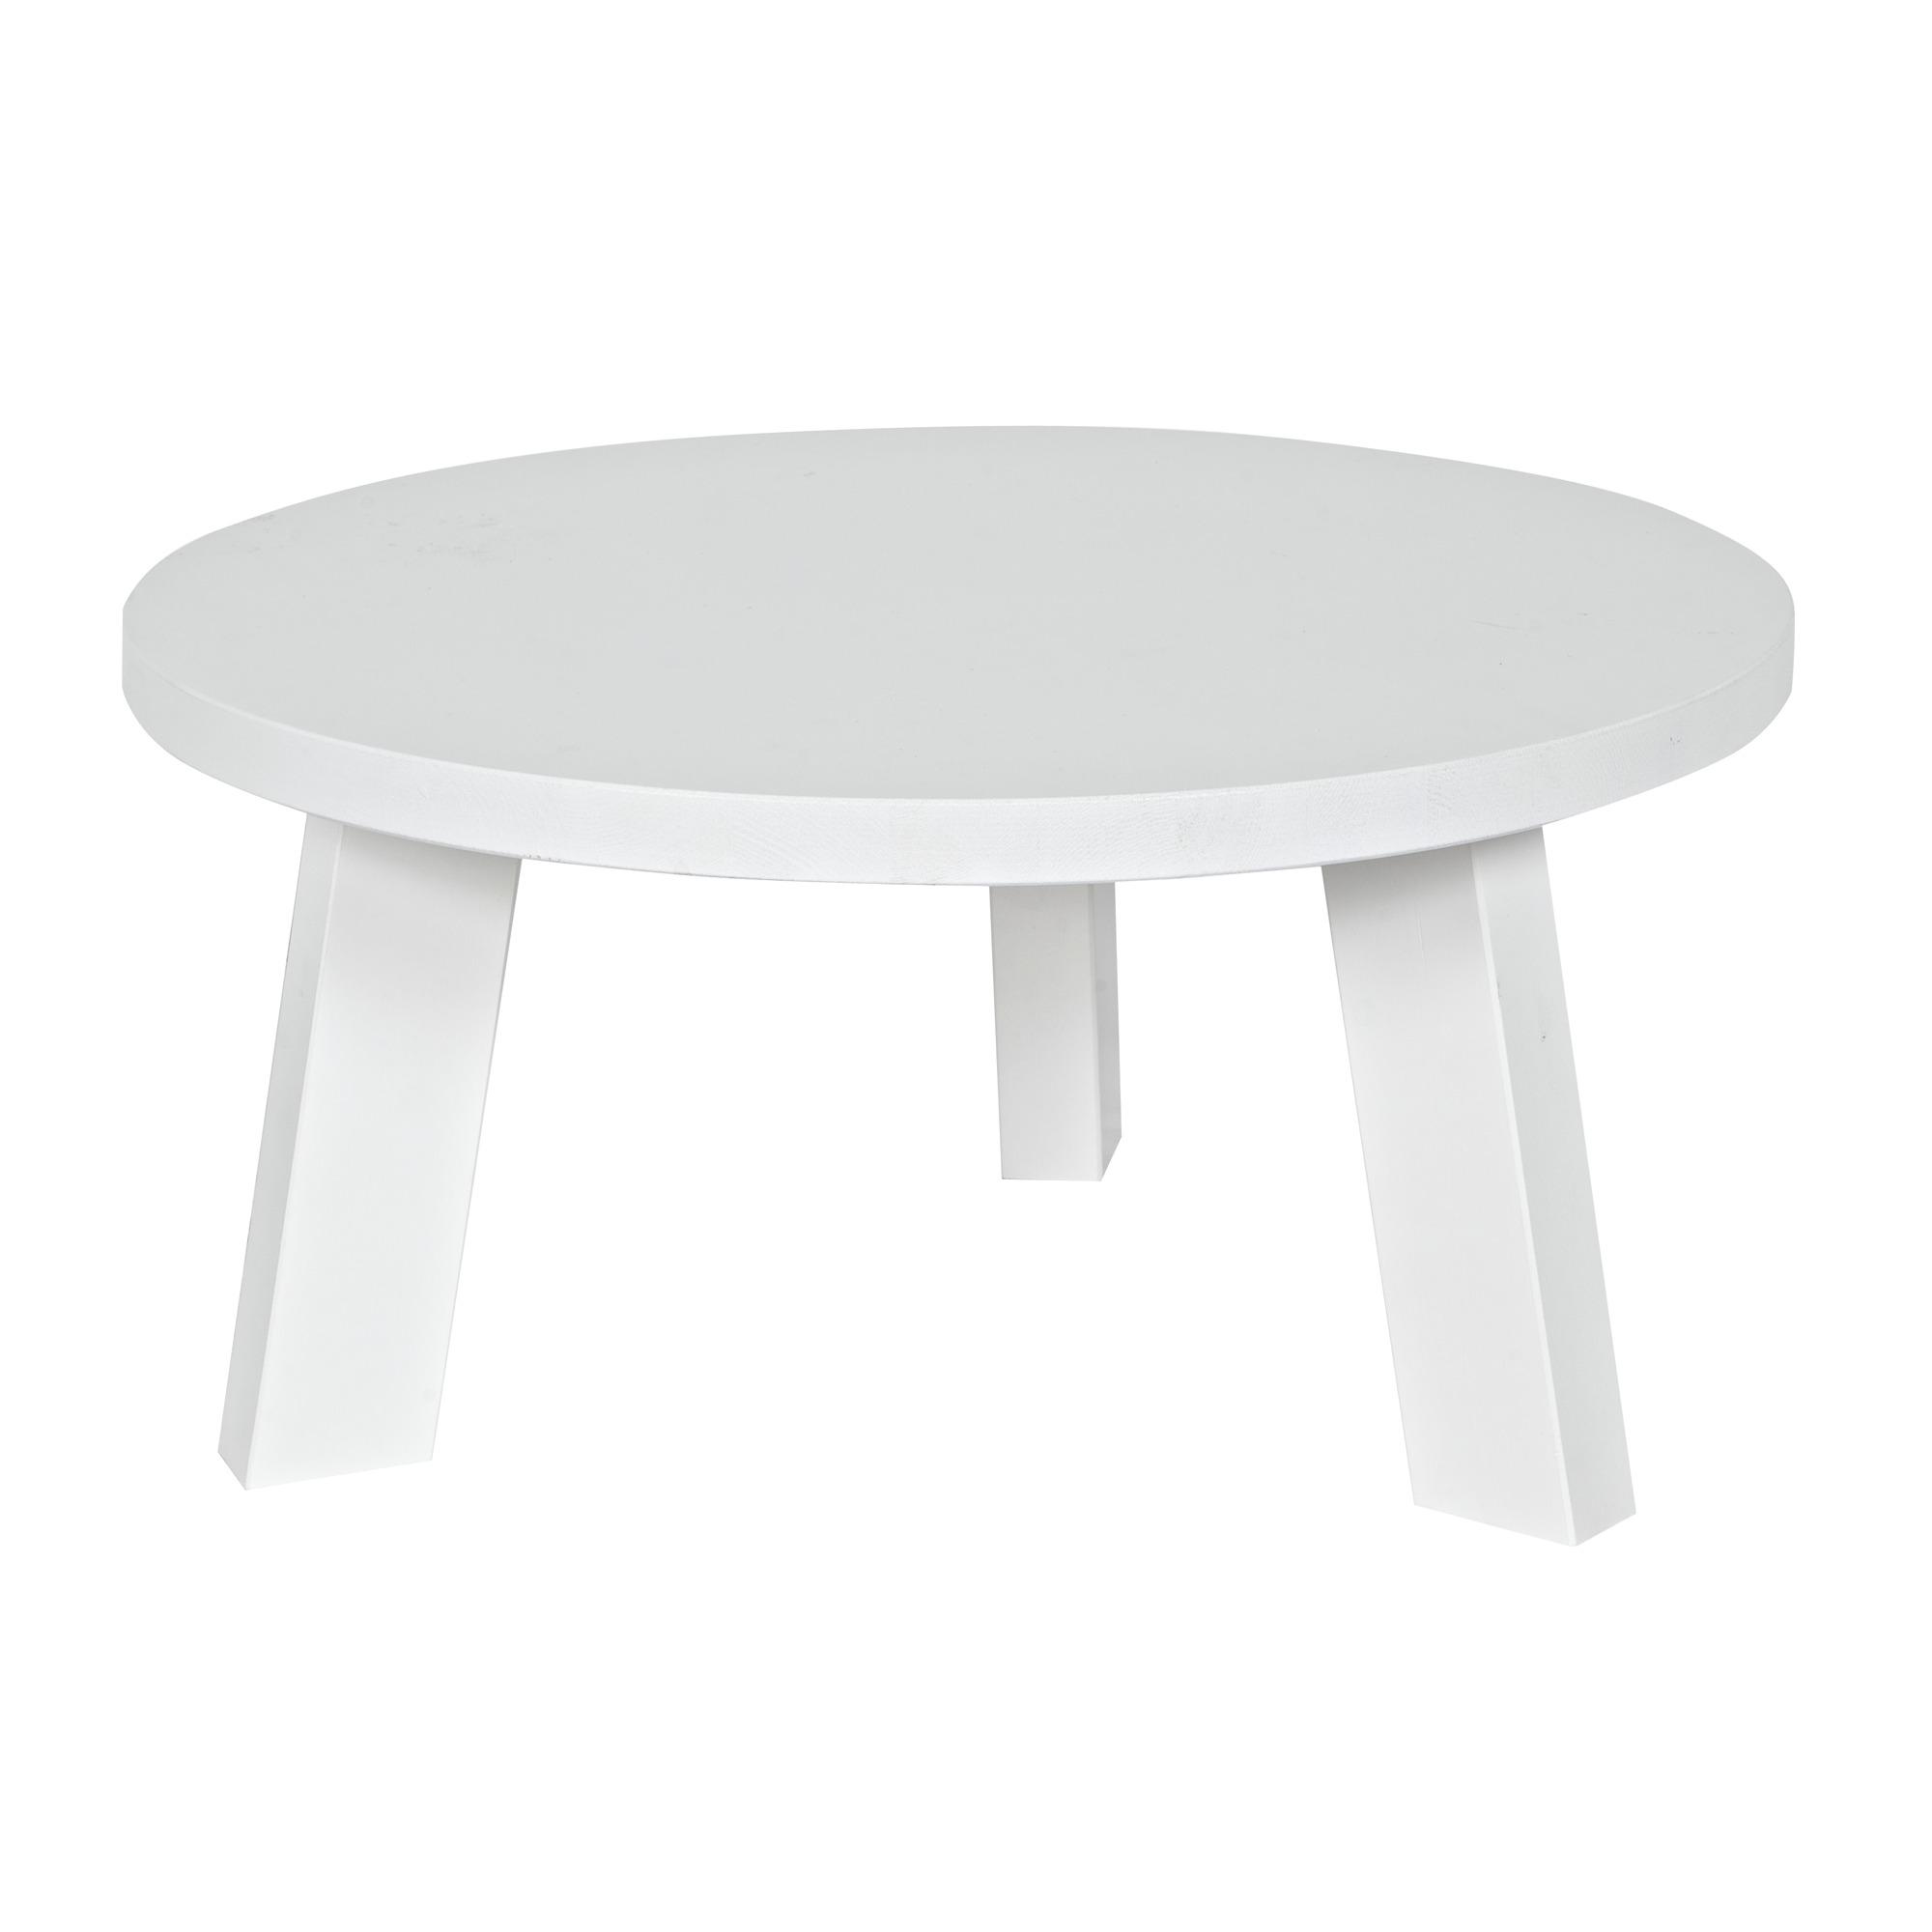 WOOOD salontafel Rhonda 60x60x30 cm grenen wit gelakt   Eettafels   Tafels   Meubelen   GAMMA be